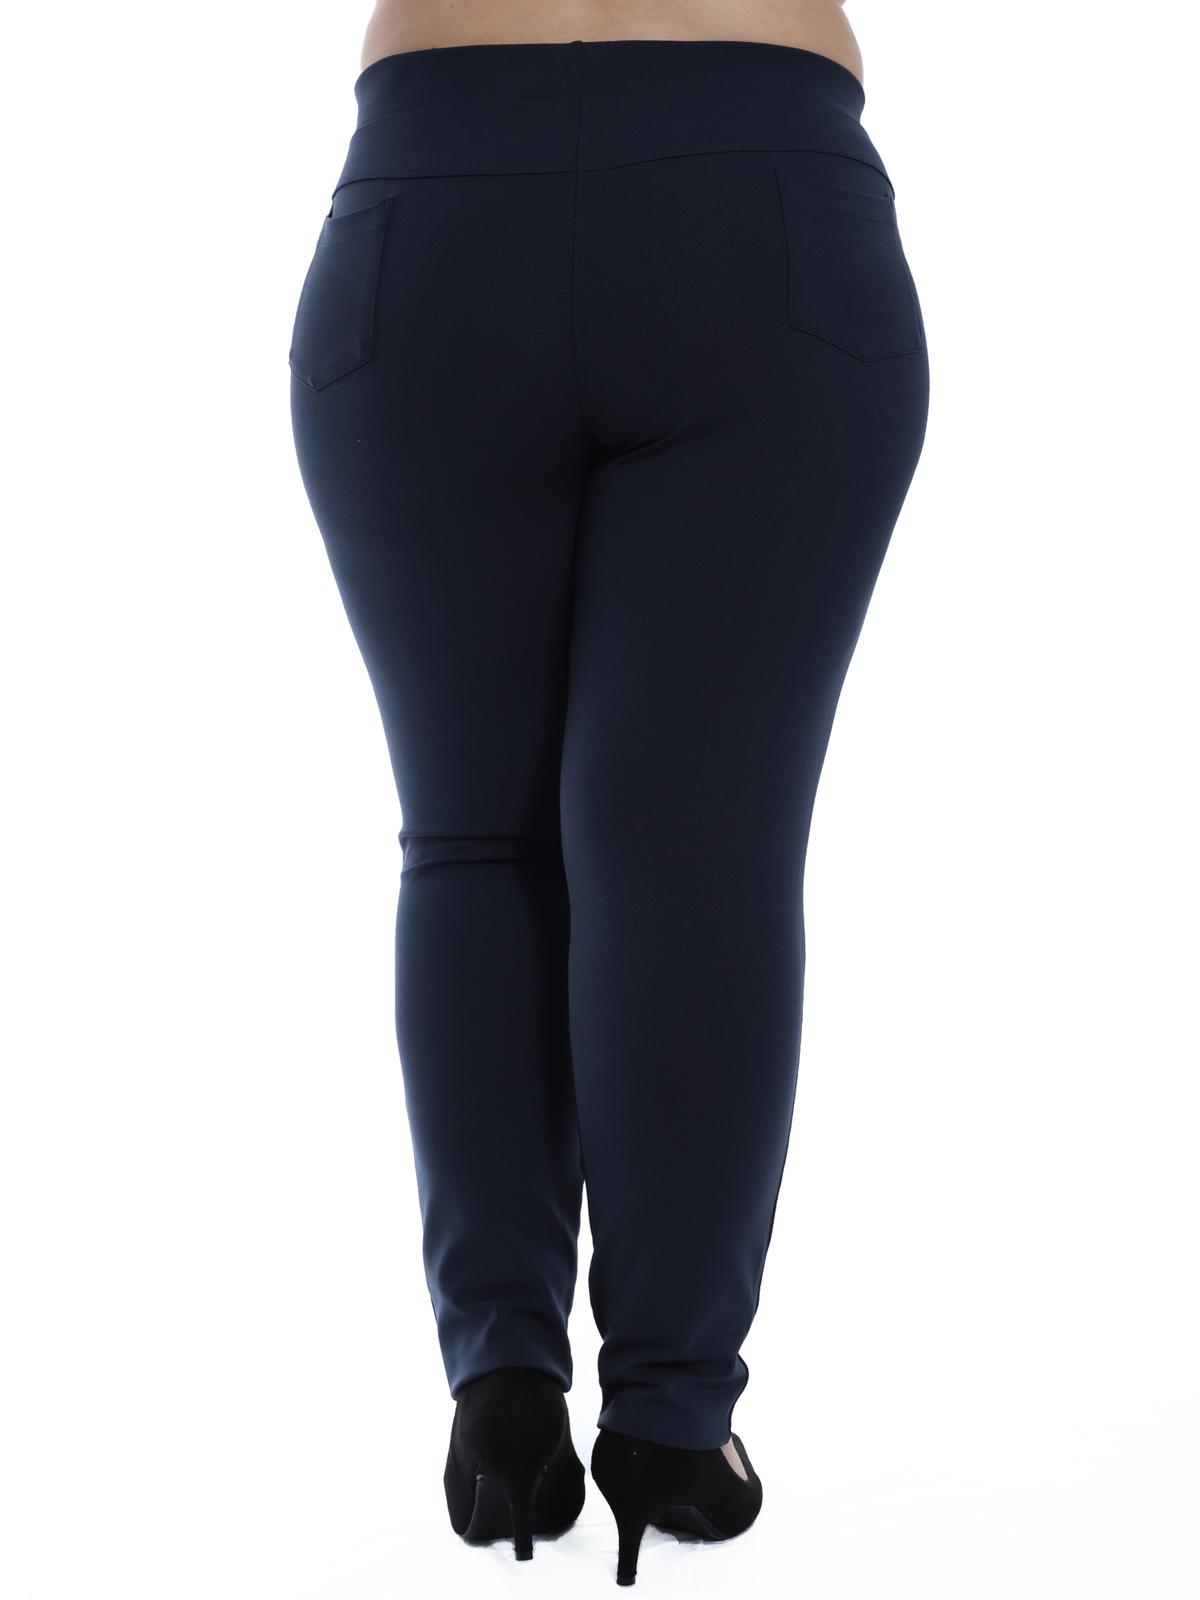 Calça Plus Size Feminina Body Fit Grossa Recortes Azul Marinho